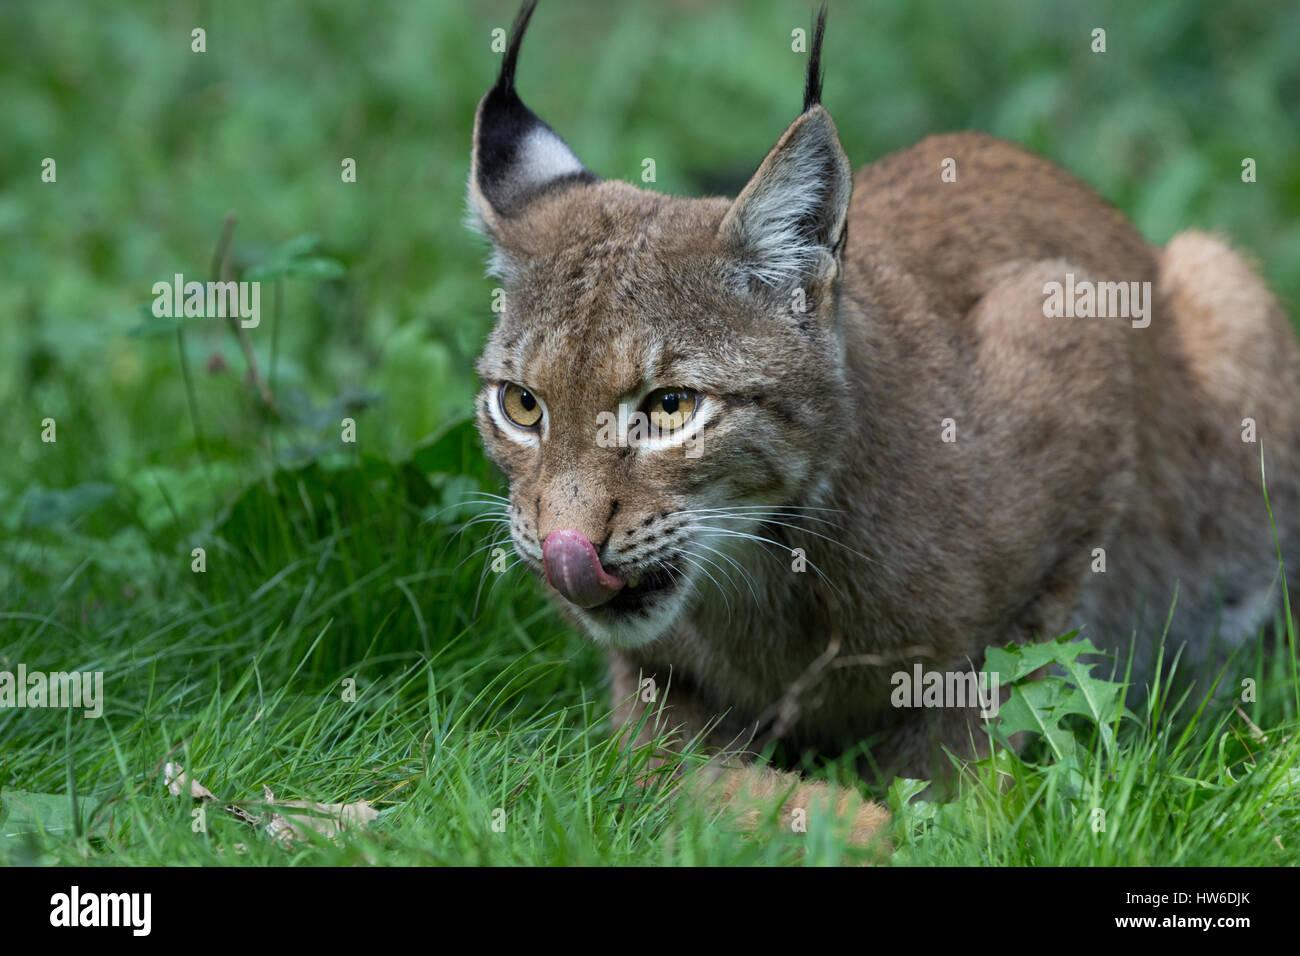 Katze Futter Stockfotos & Katze Futter Bilder - Alamy